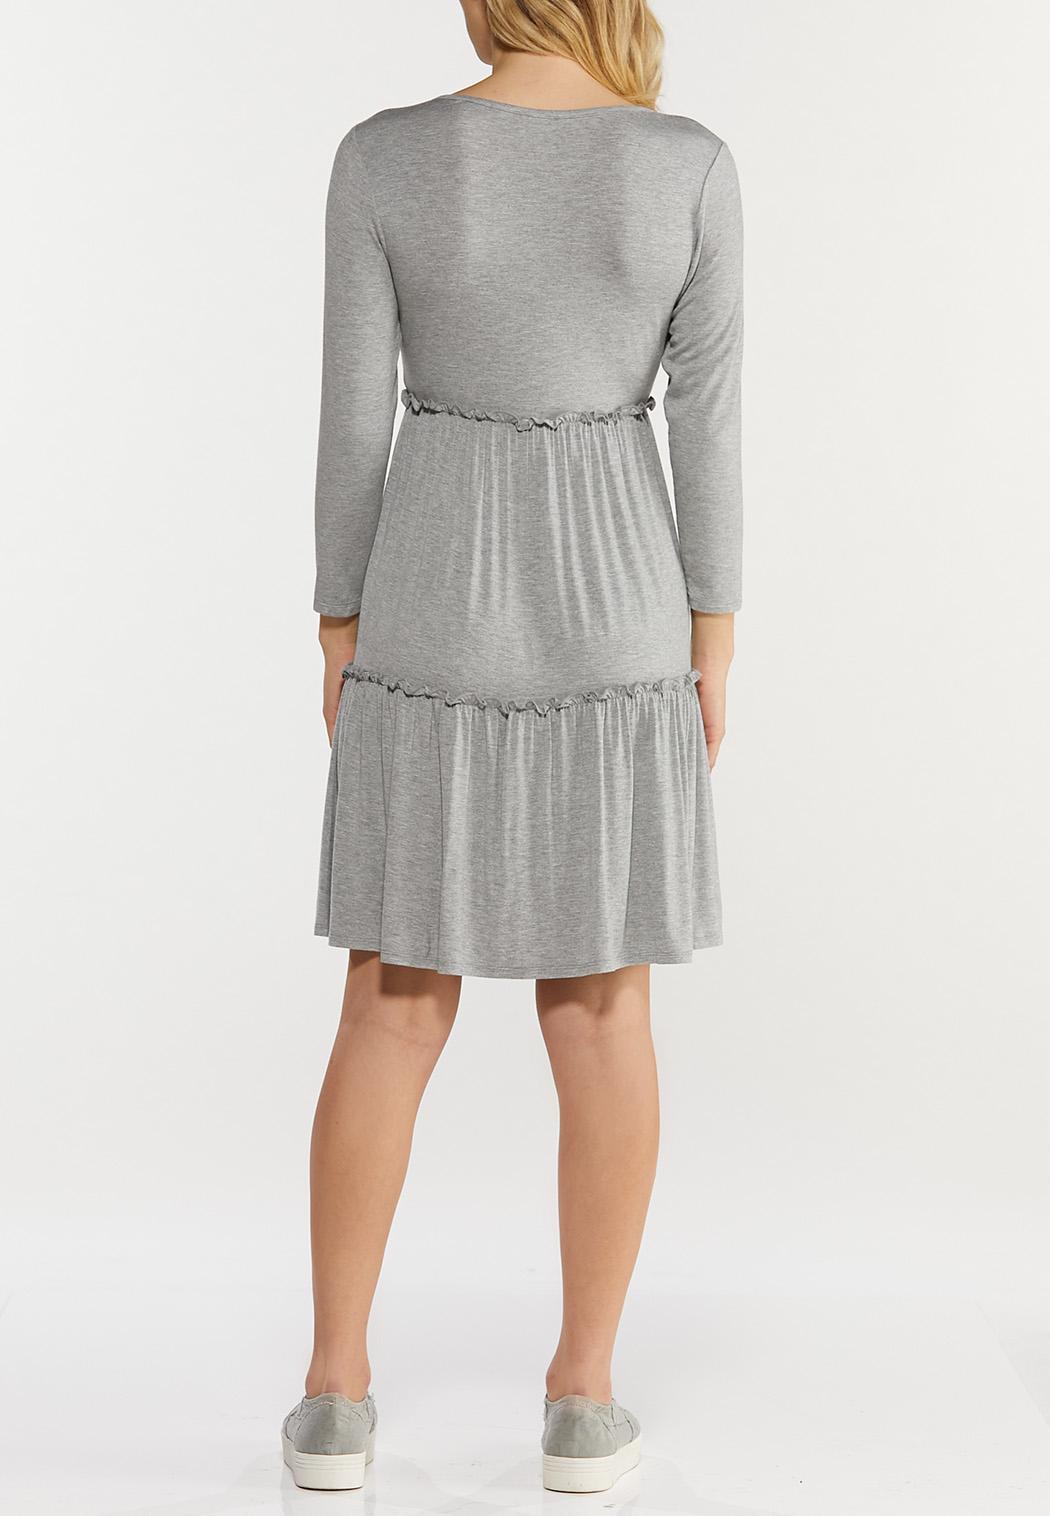 Gray Ruffled Babydoll Dress (Item #44500382)